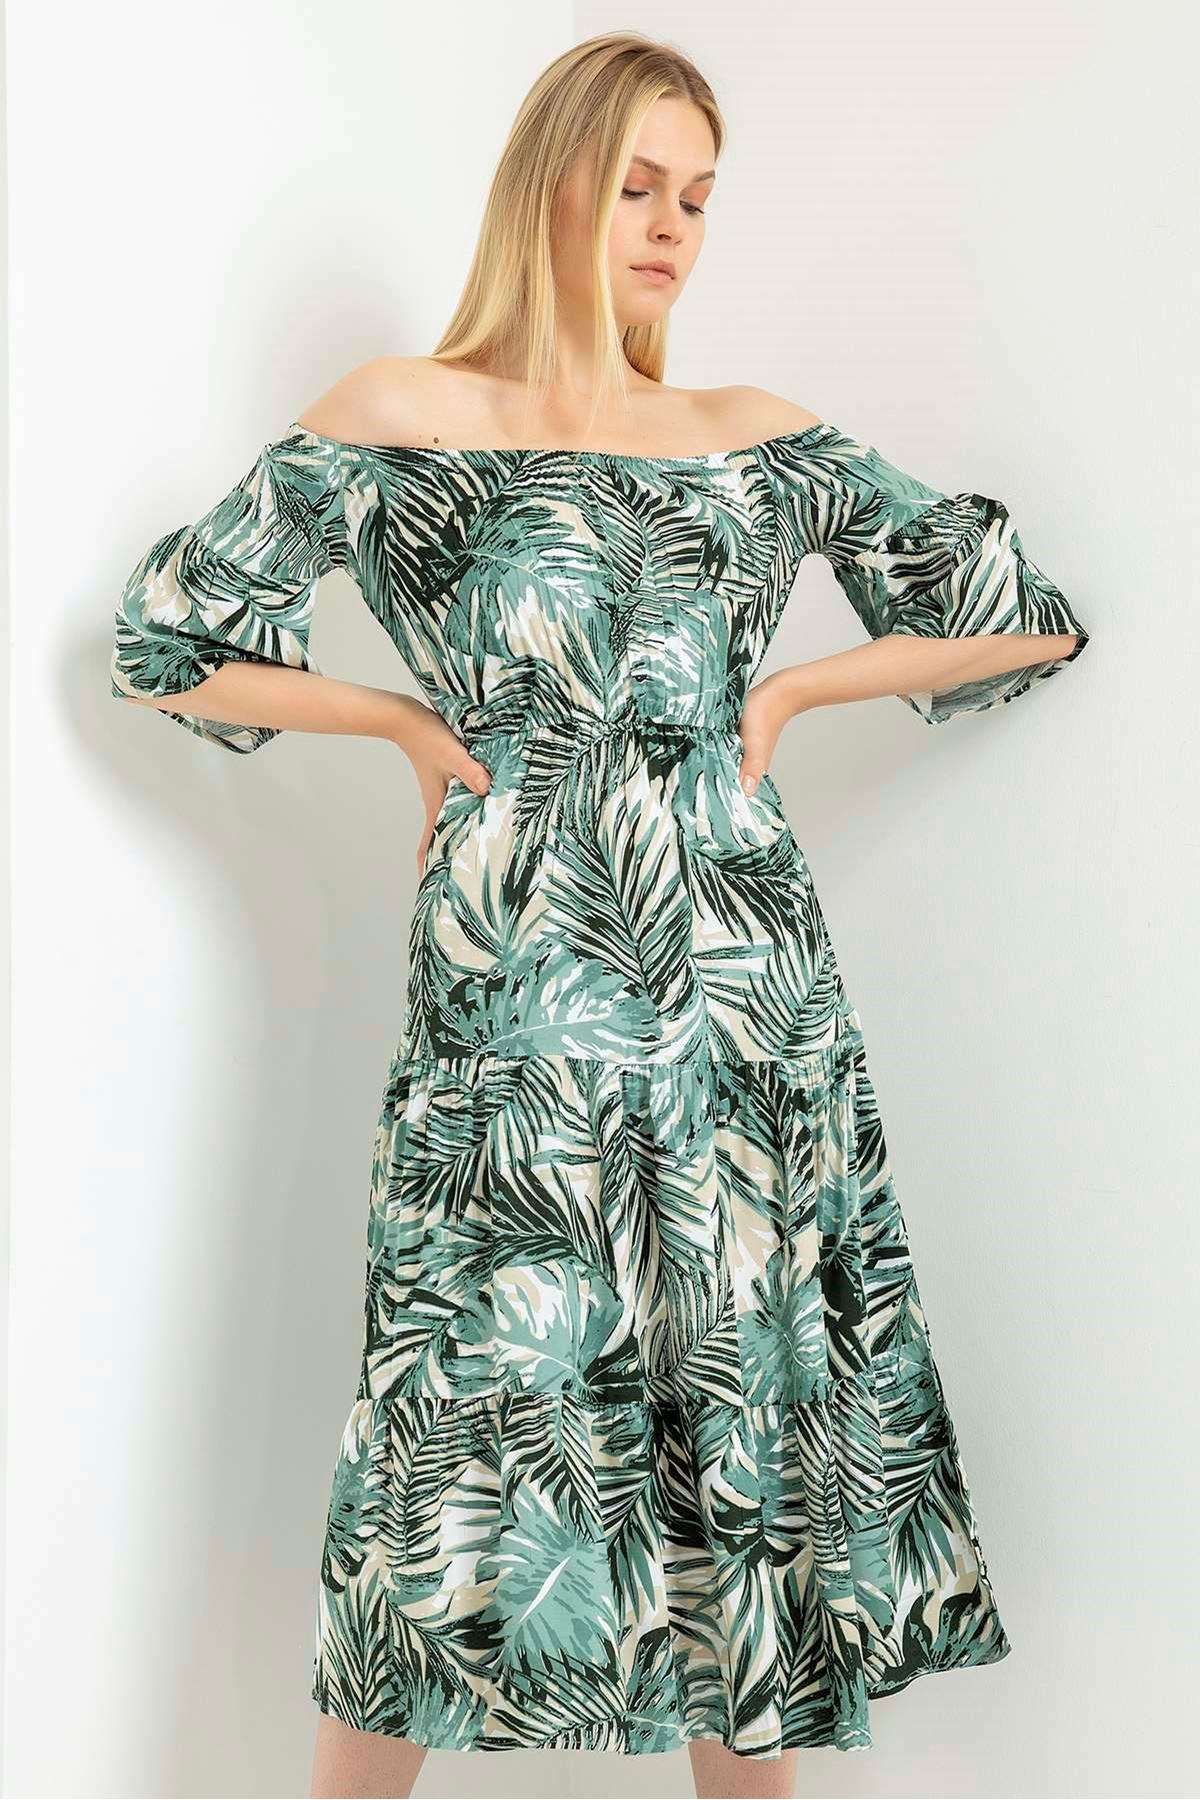 Palmiye Desen Madonna Yaka Elbise-Haki